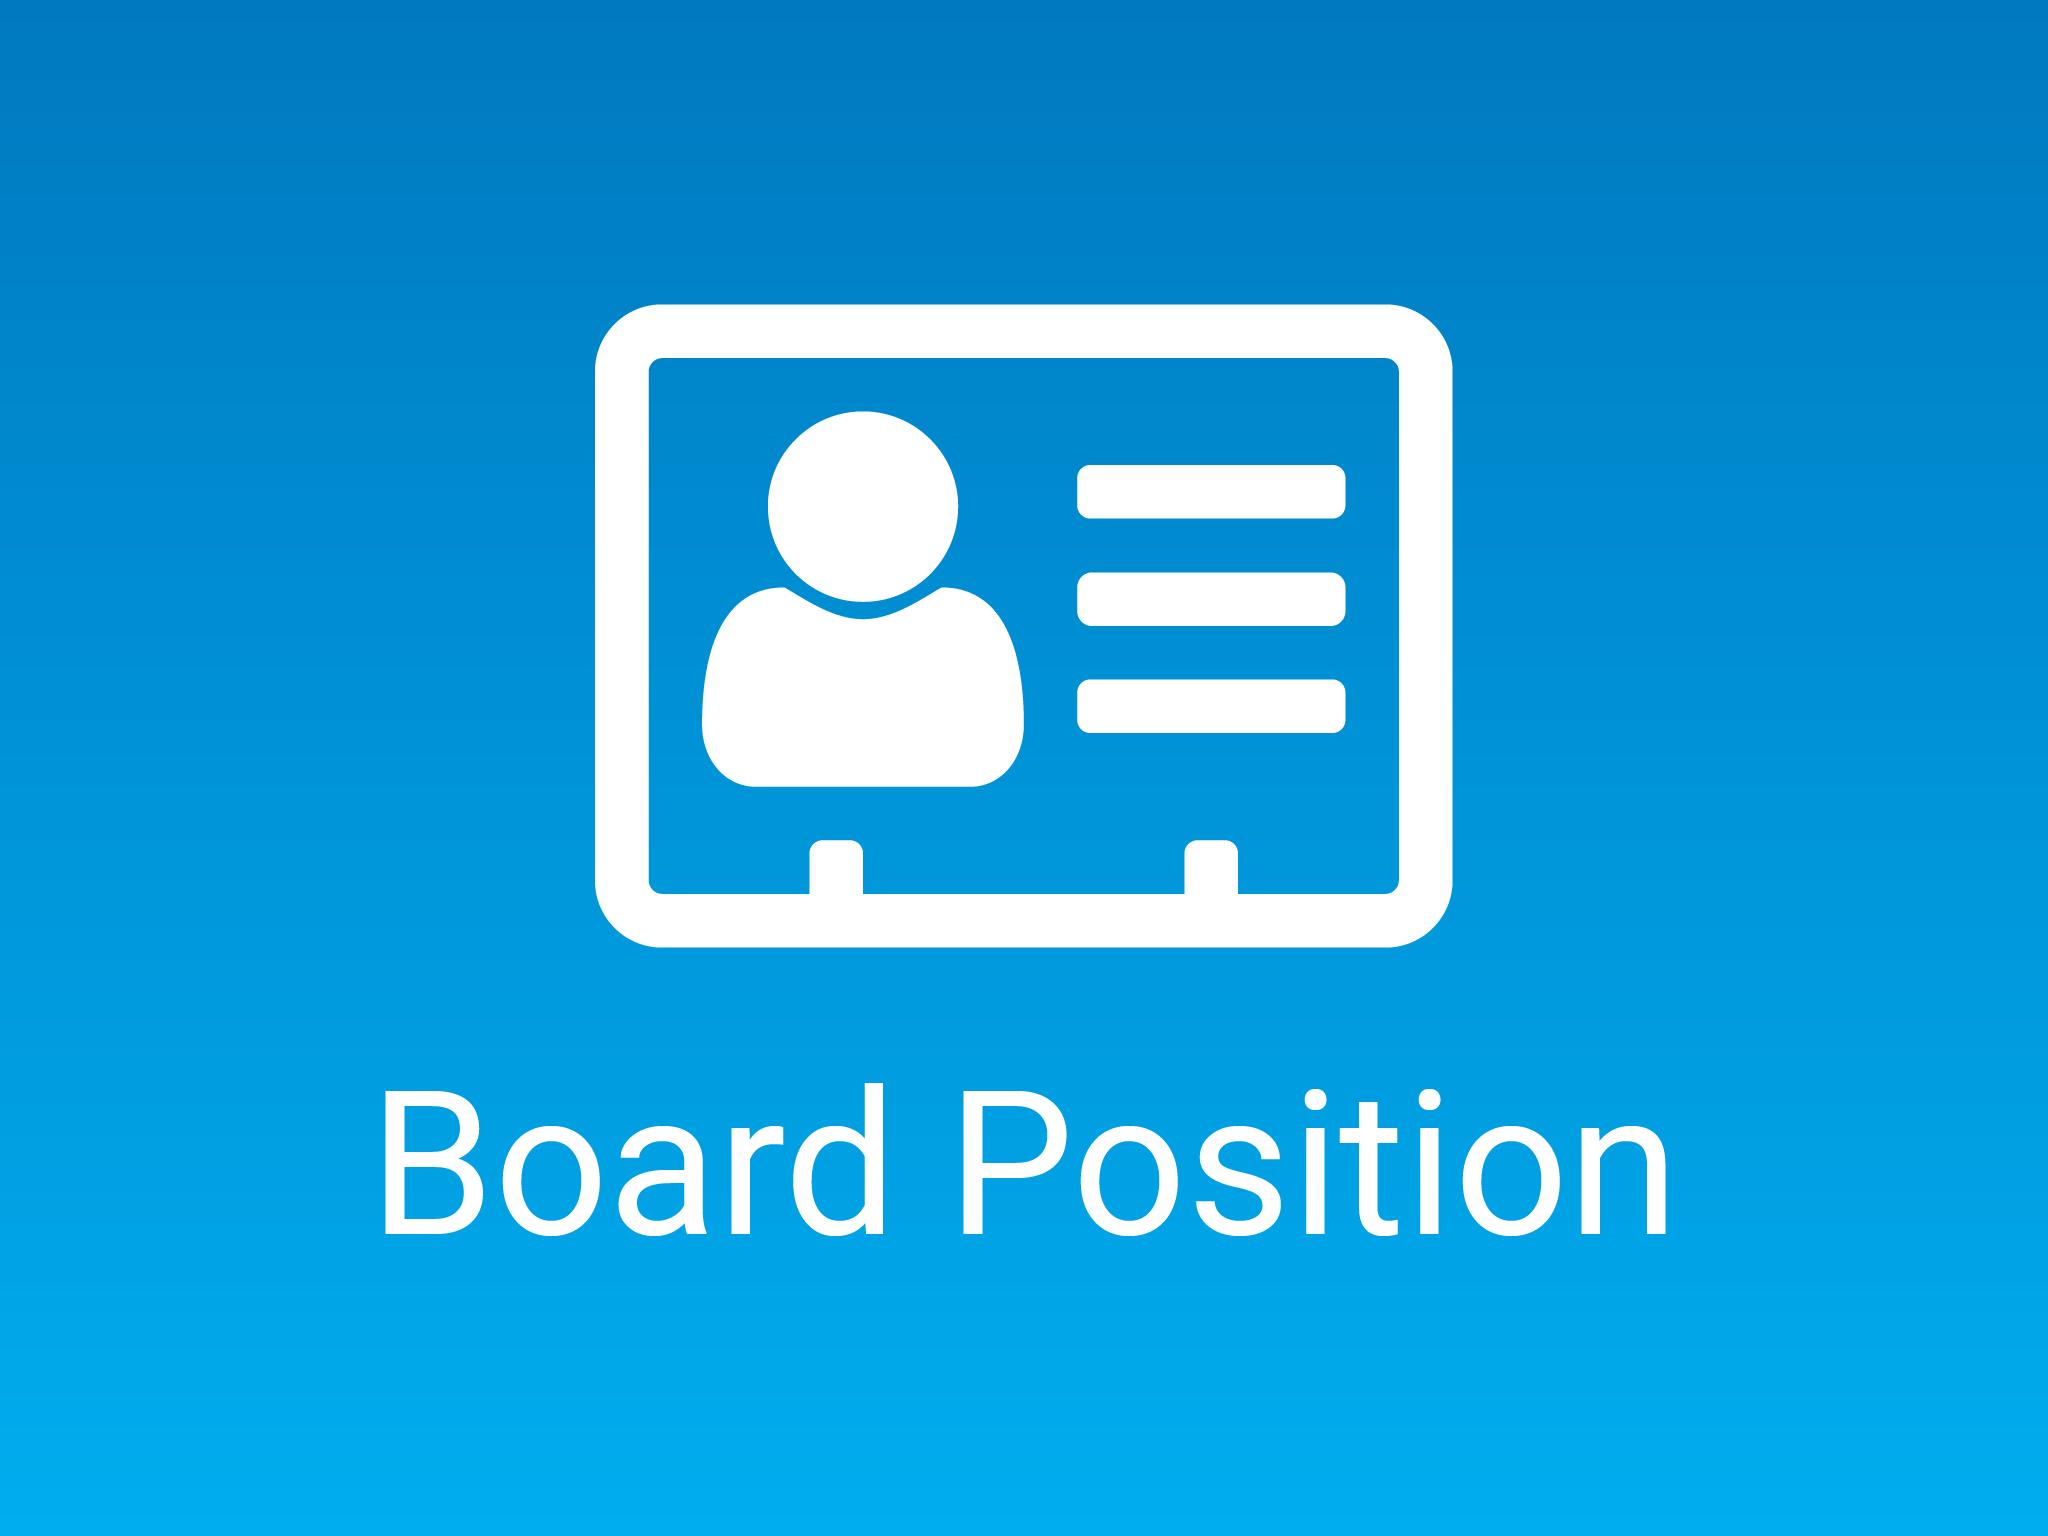 Board Position